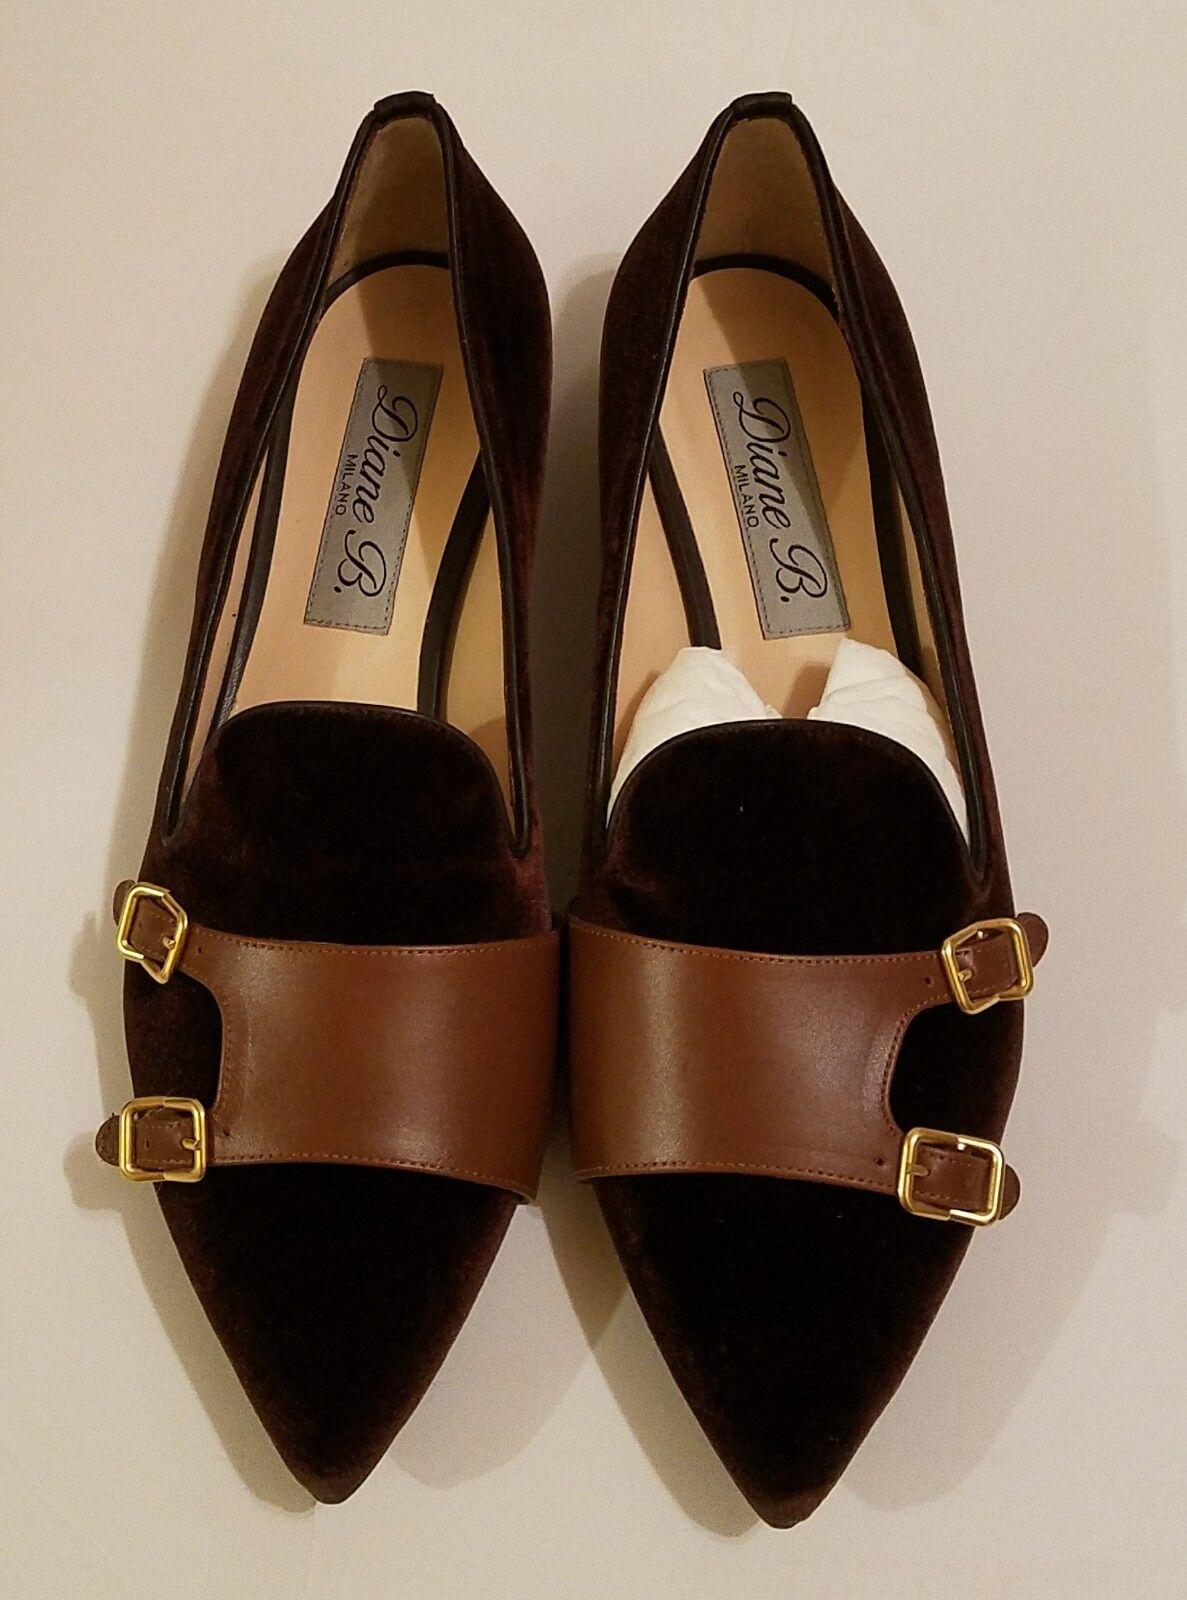 NWB Diane B B B Milano Ladies shoes Velvet Pointy Monk Flats Brn Tan Sz 41 (10 10.5) 5e2563